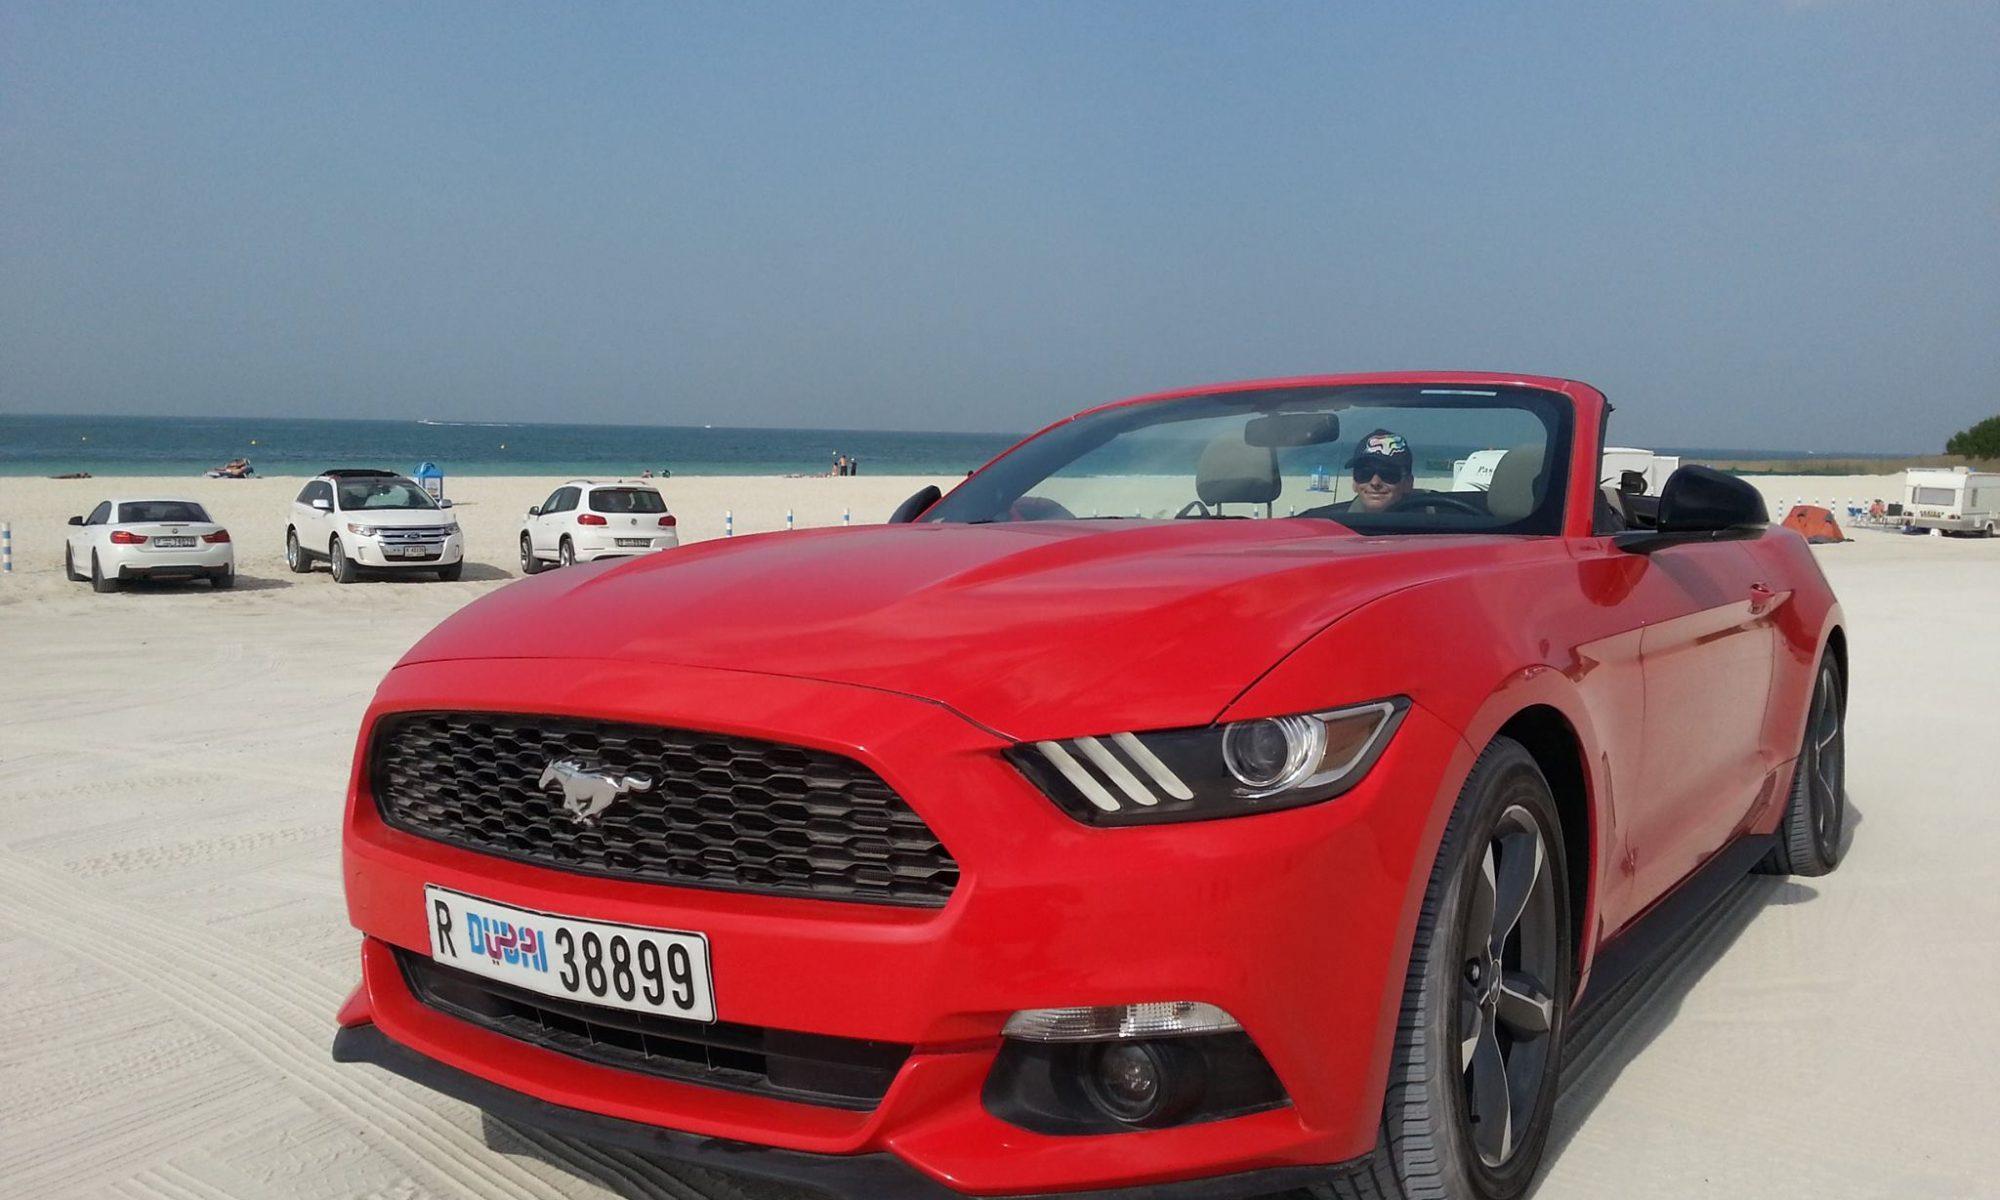 Mustang Cabrio Dubai Sloboda